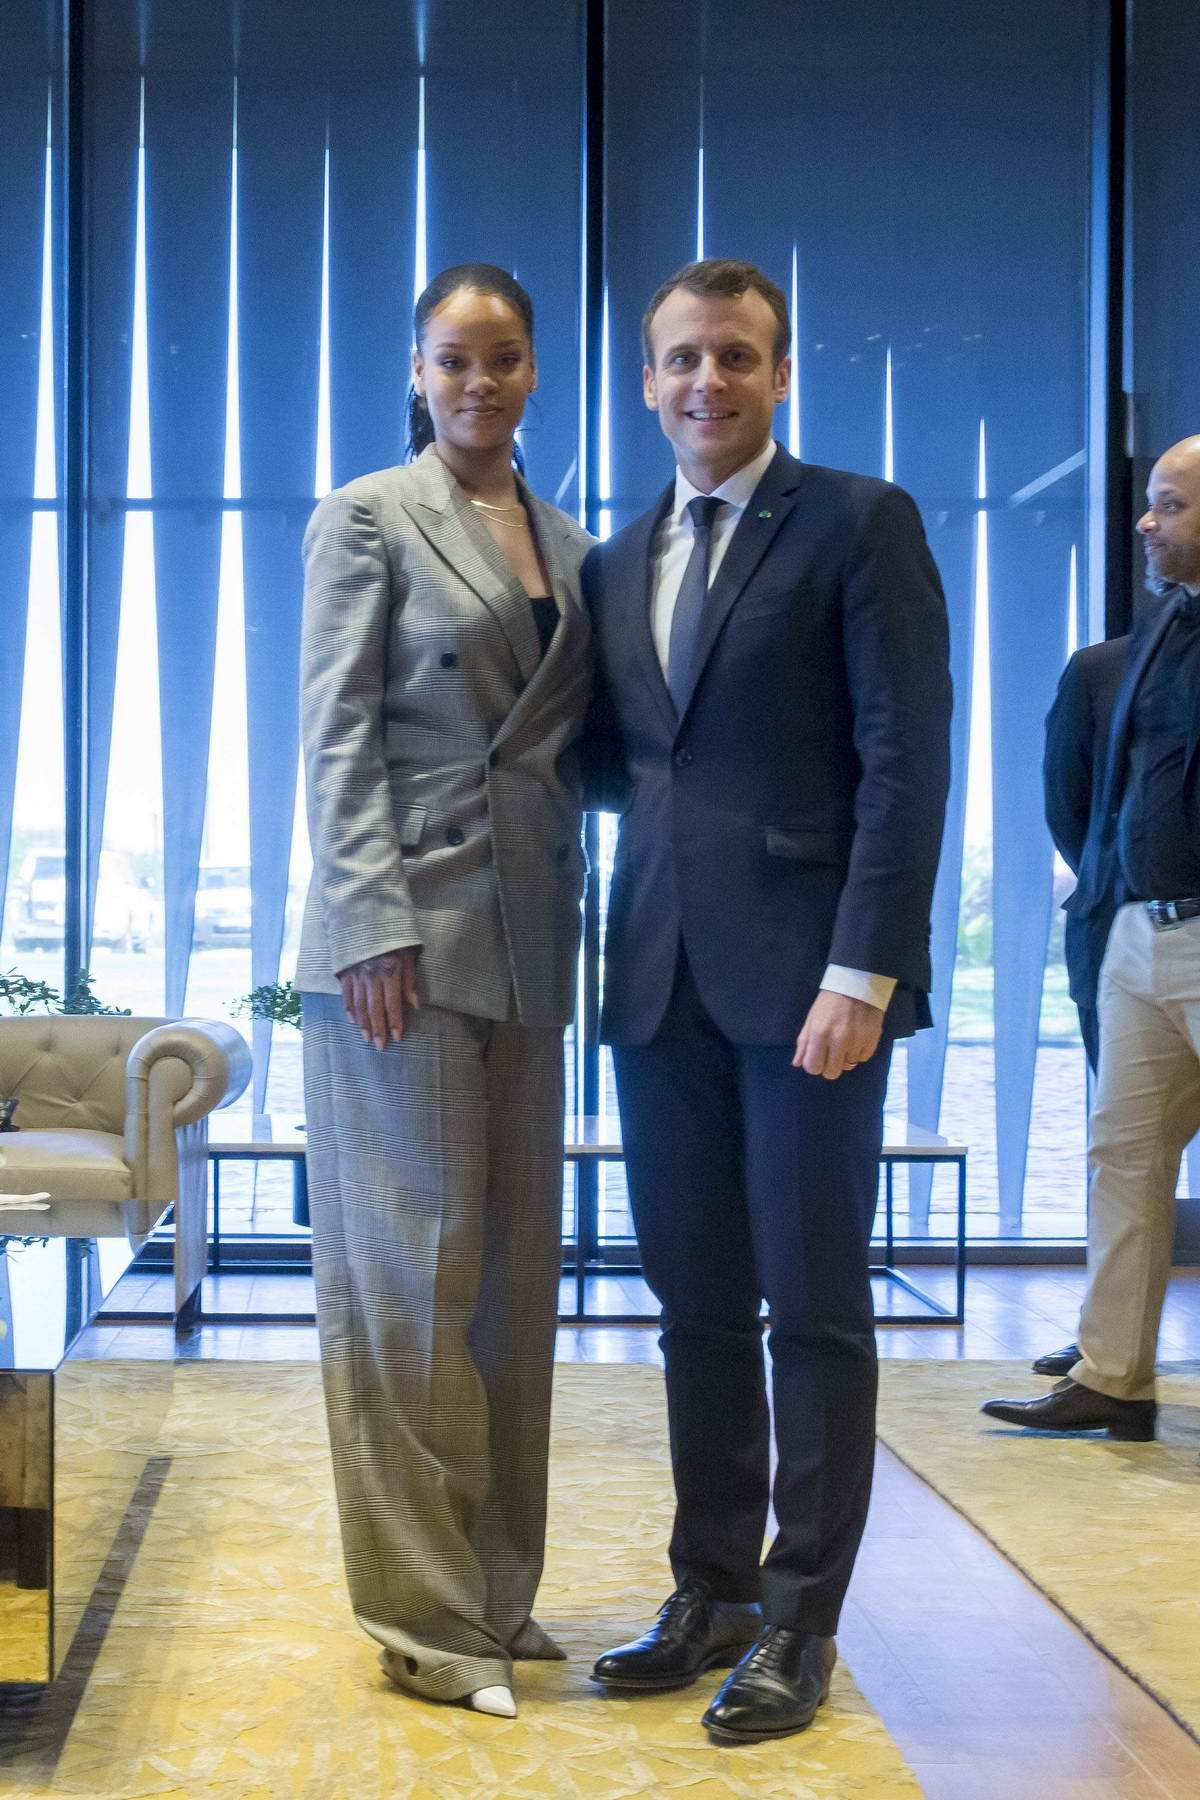 Rihanna attends the GPE Financing Conference in Dakar, Senegal